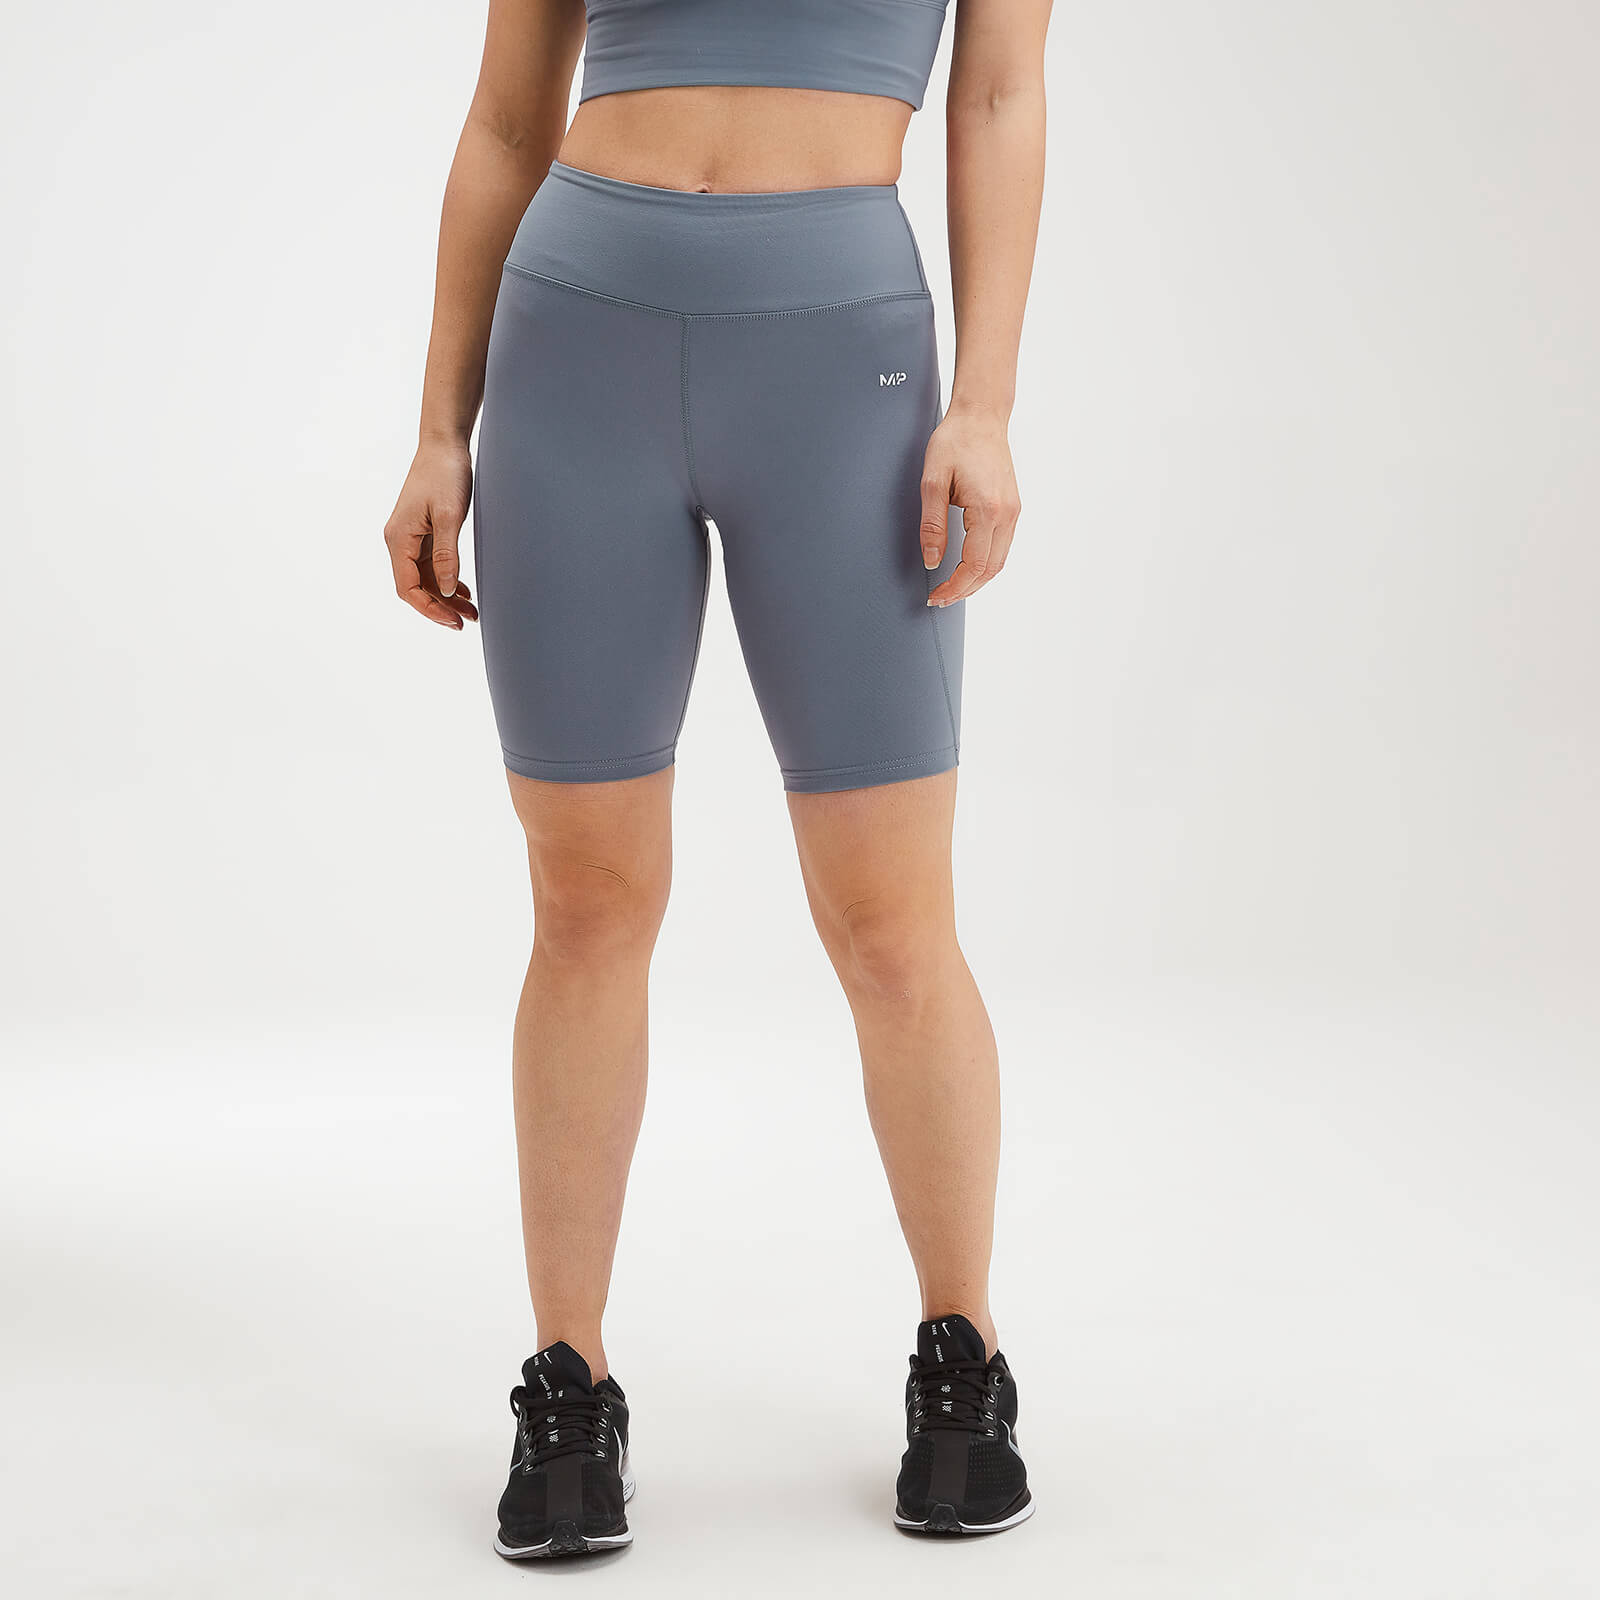 Купить MP Women's Power Cycling Shorts - Galaxy - XXS, Myprotein International